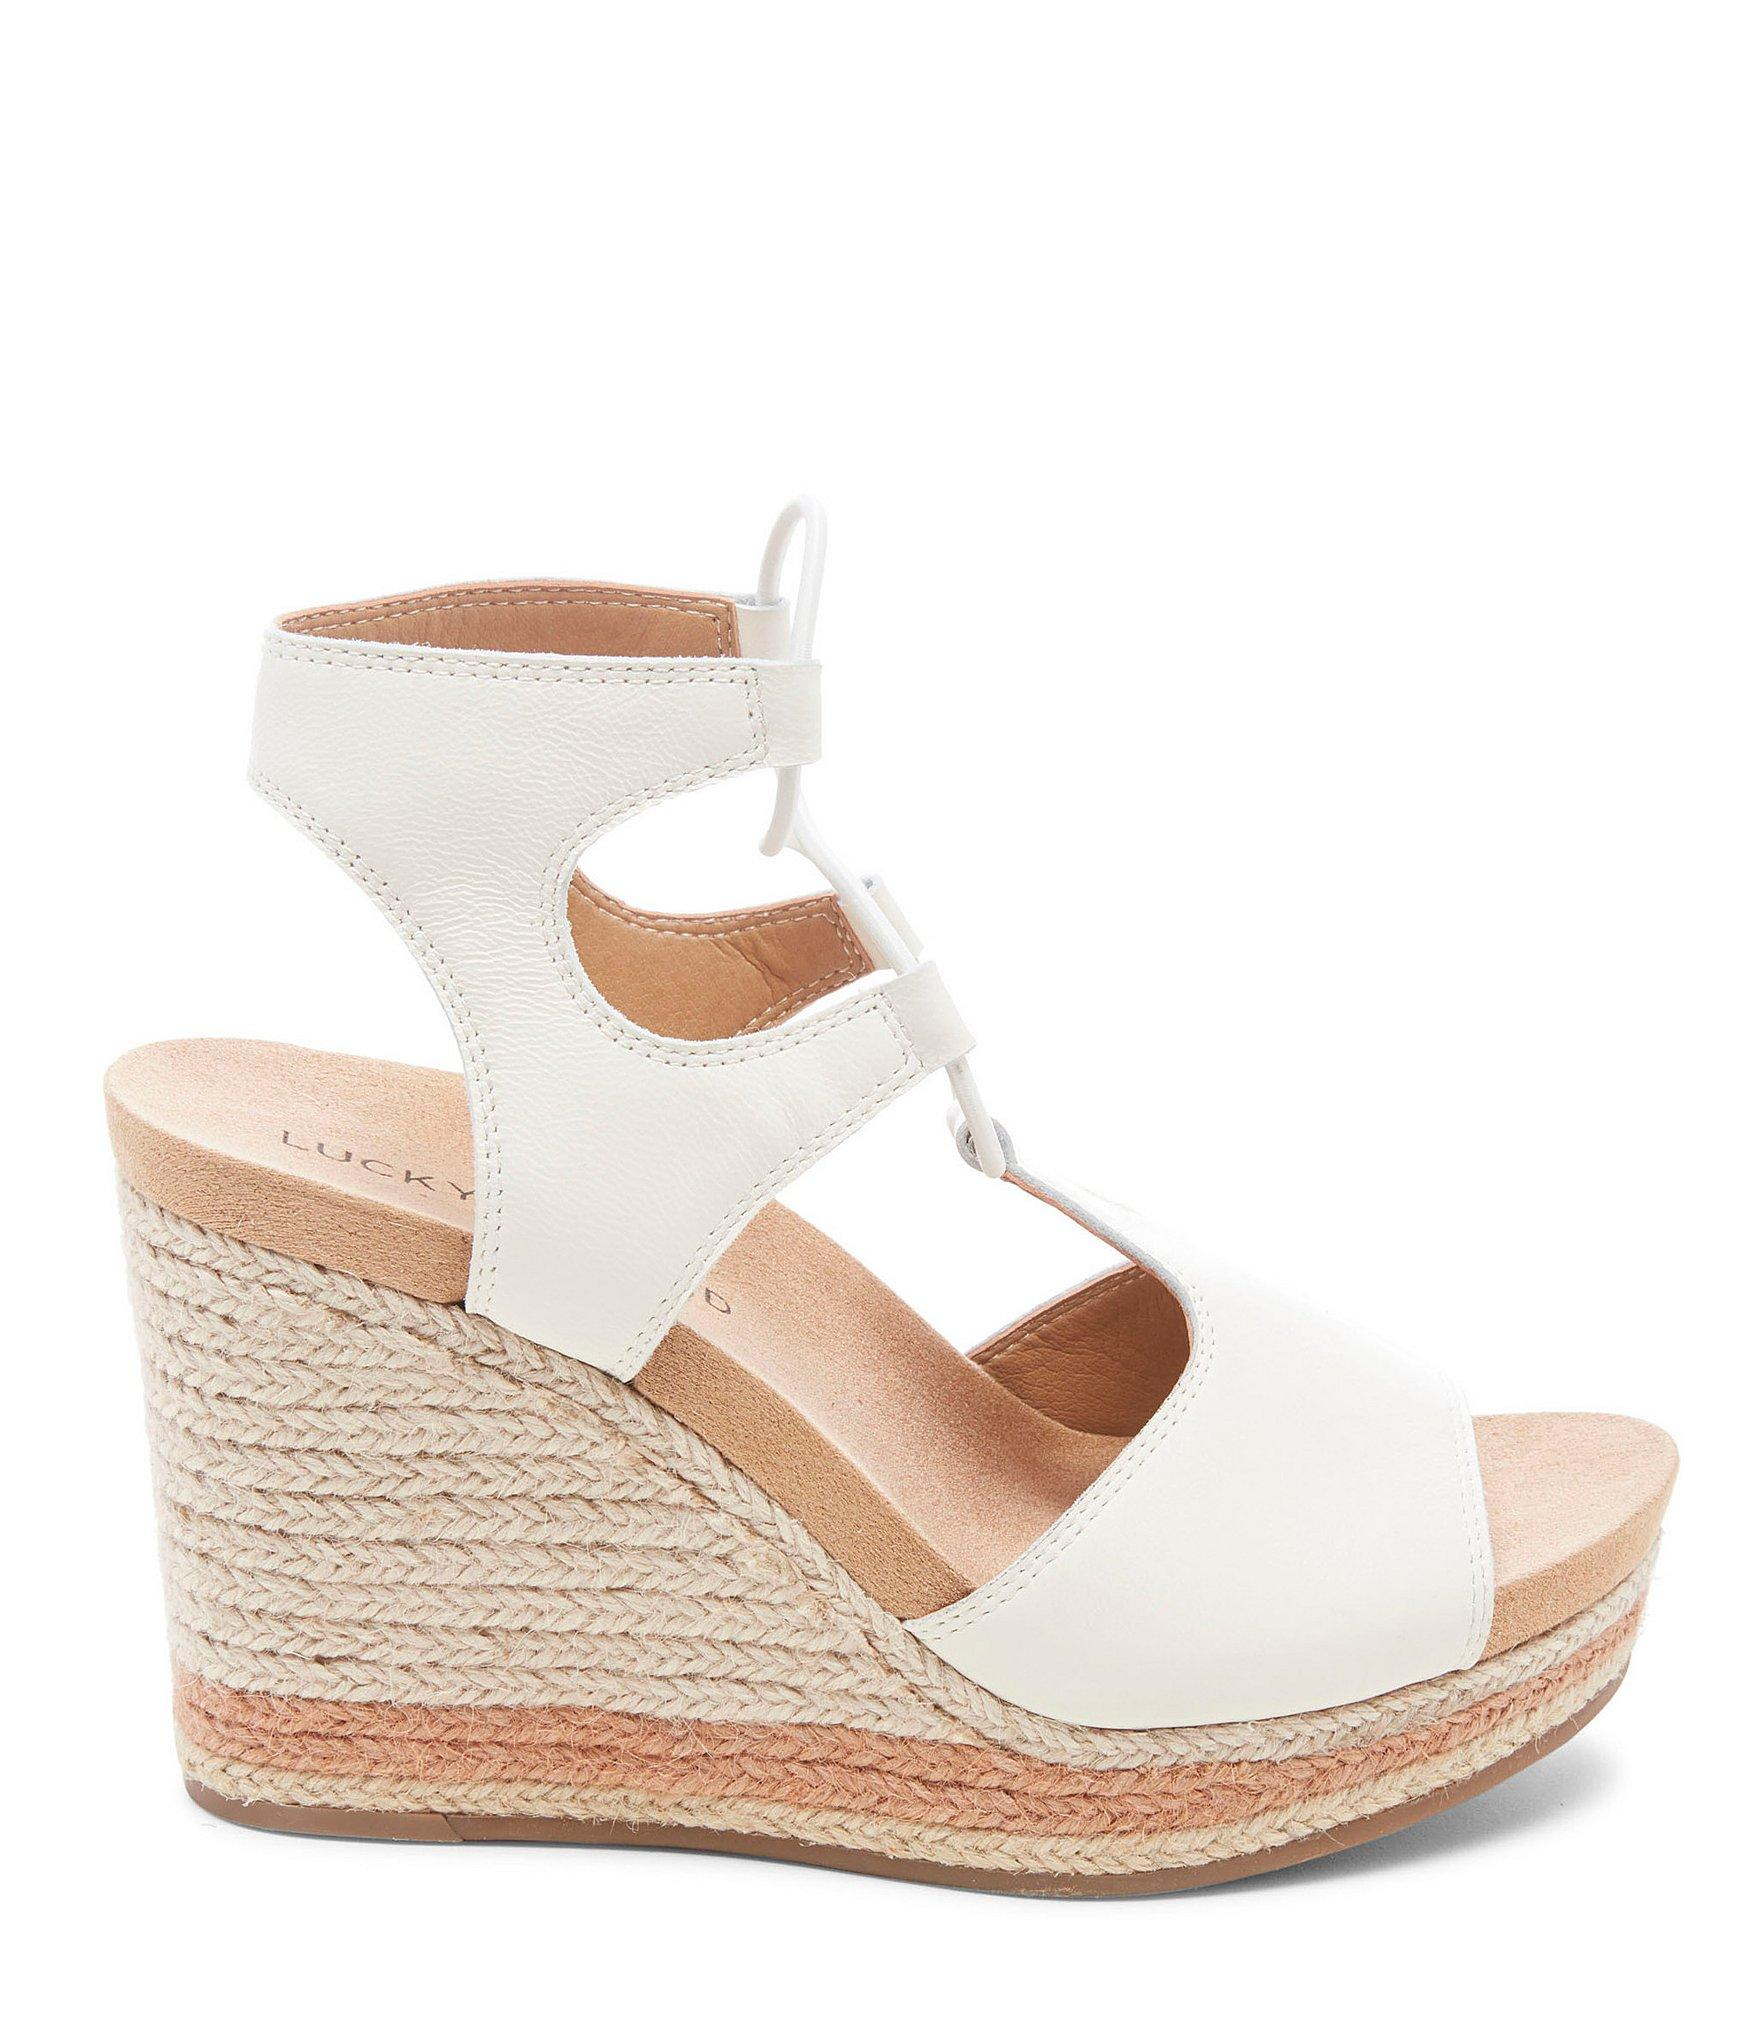 7ac76cc8b Lucky Brand - Multicolor Yejida2 Leather Platform Wedge Sandals - Lyst.  View fullscreen